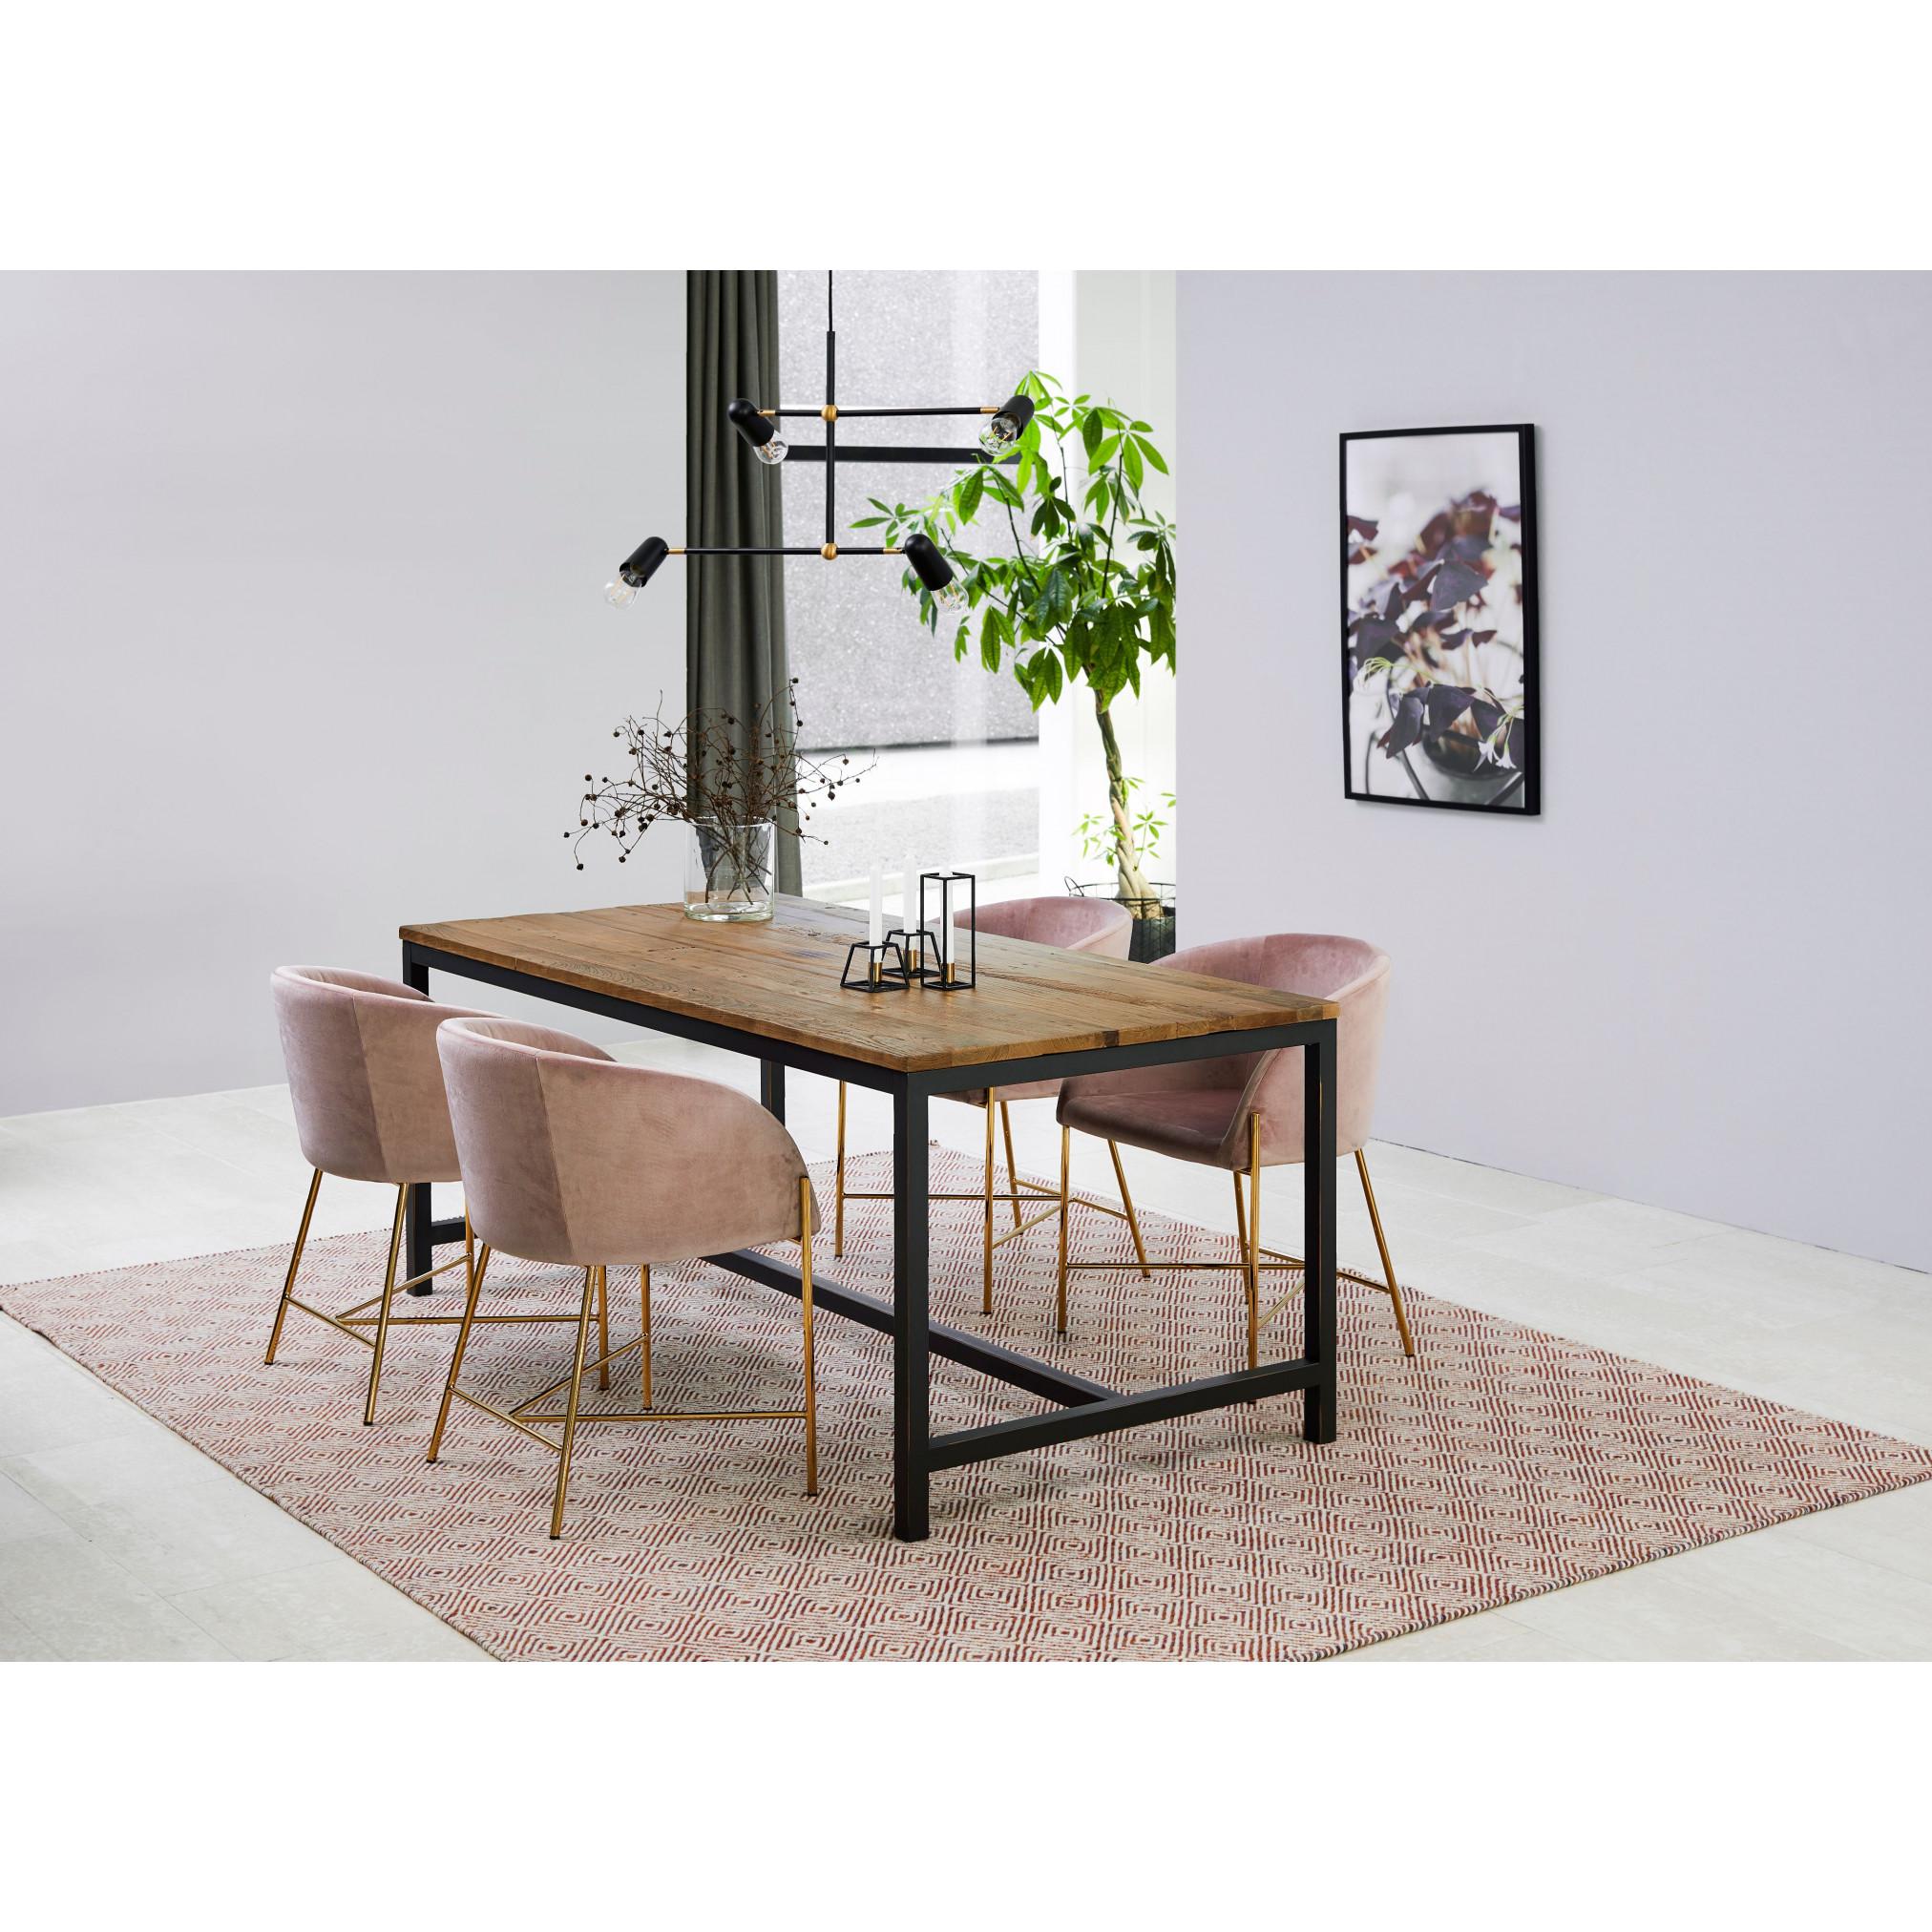 Dining Table Vin Large   Dark Wood